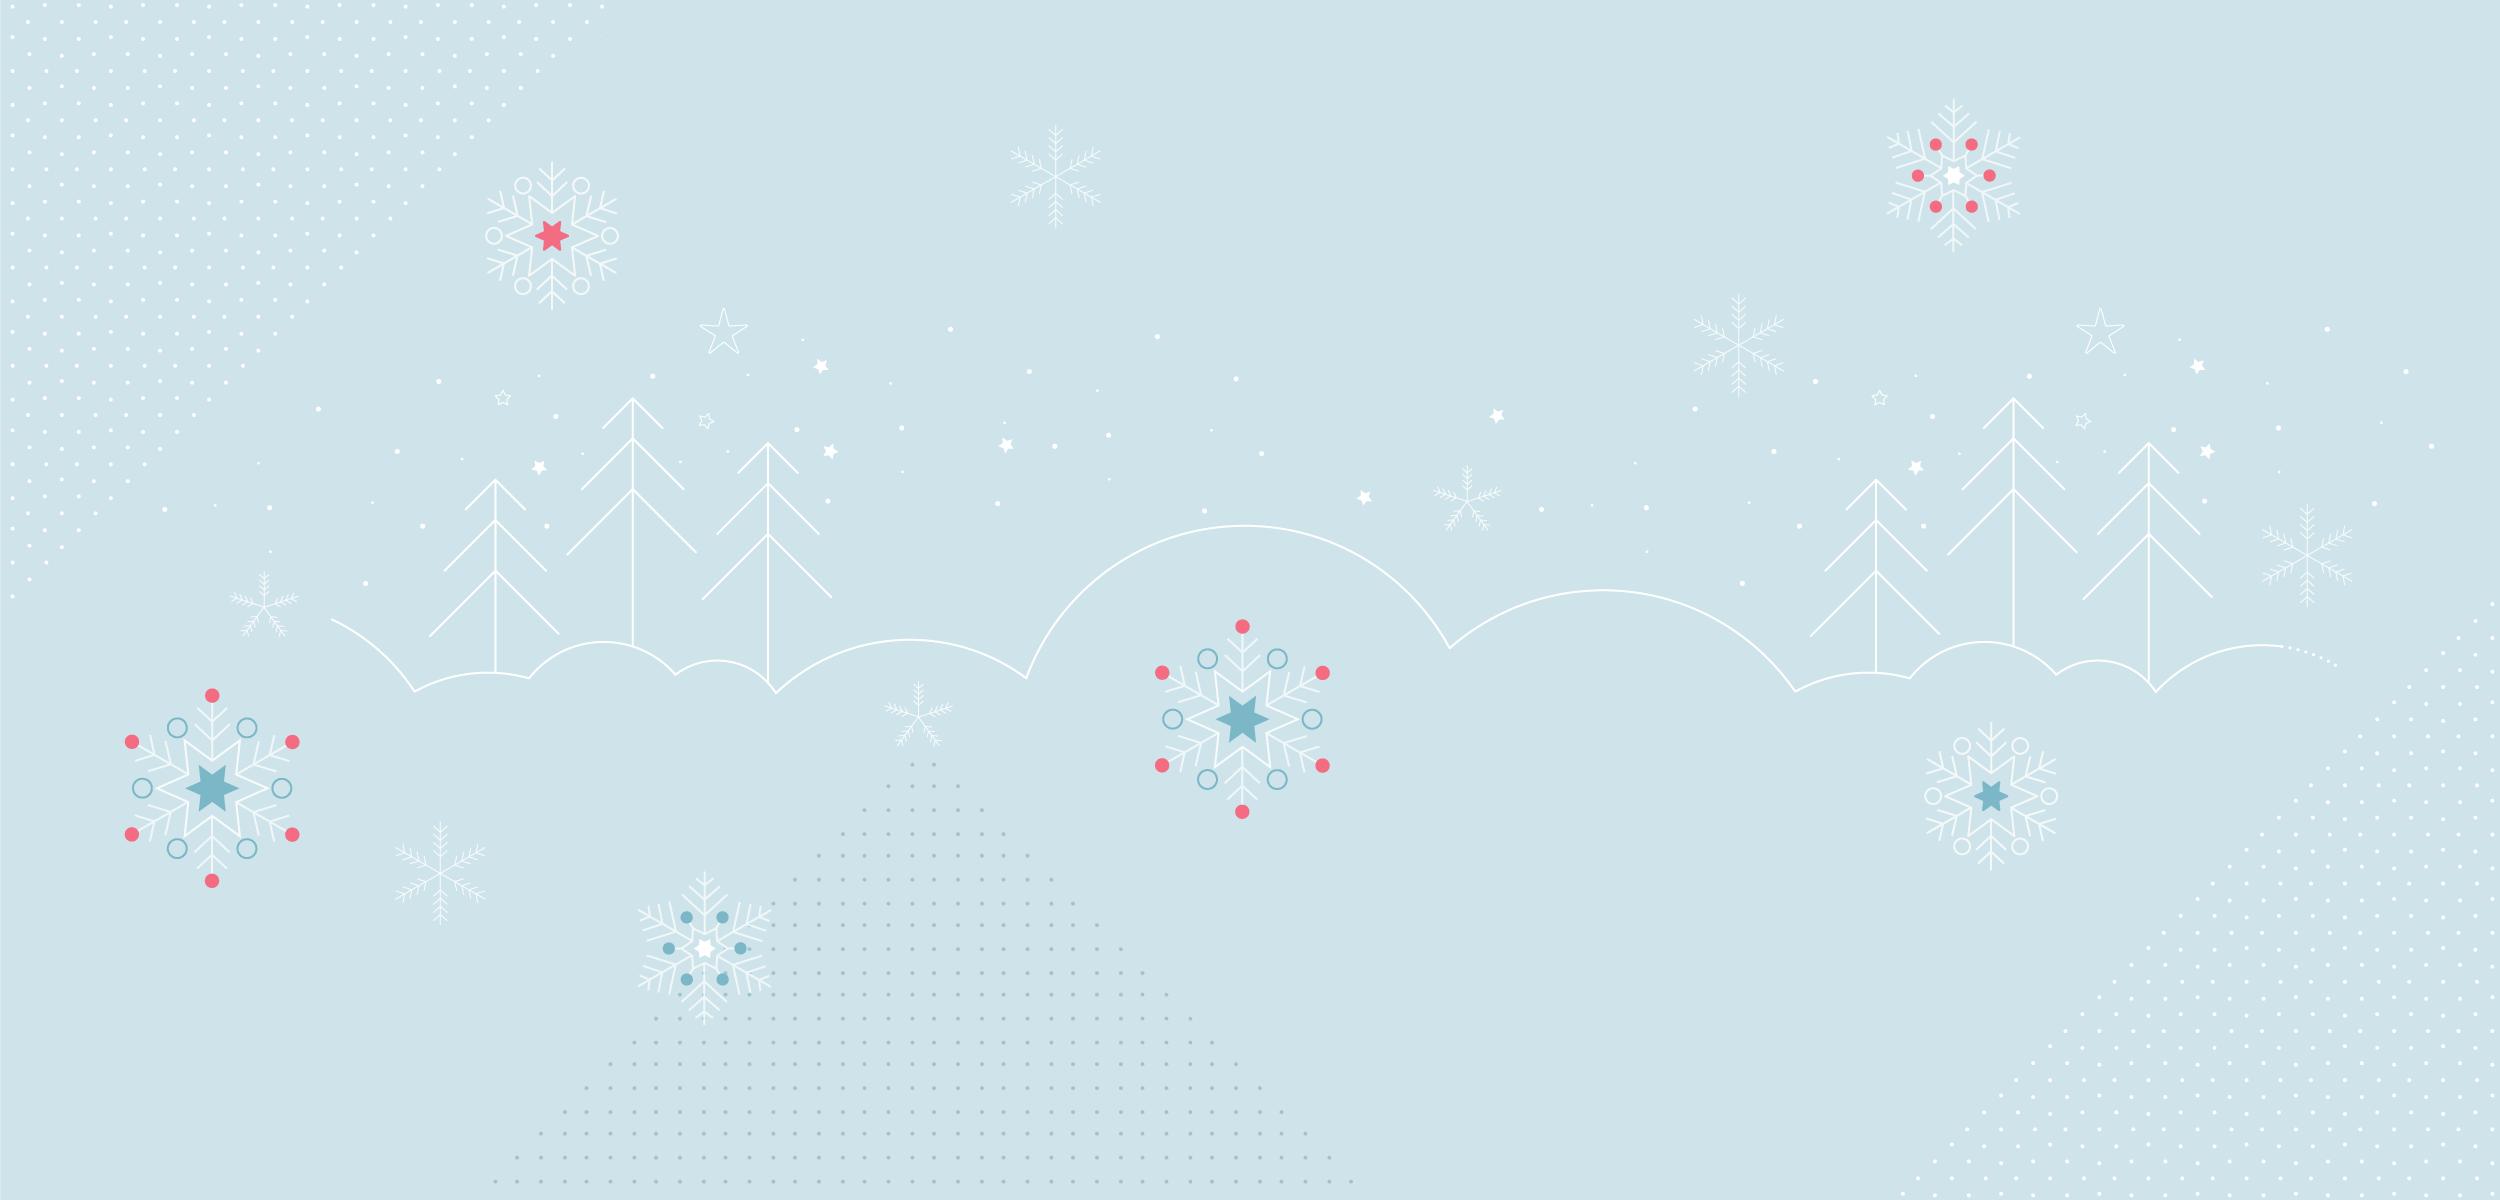 Create a Snowflake in Adobe Illustrator